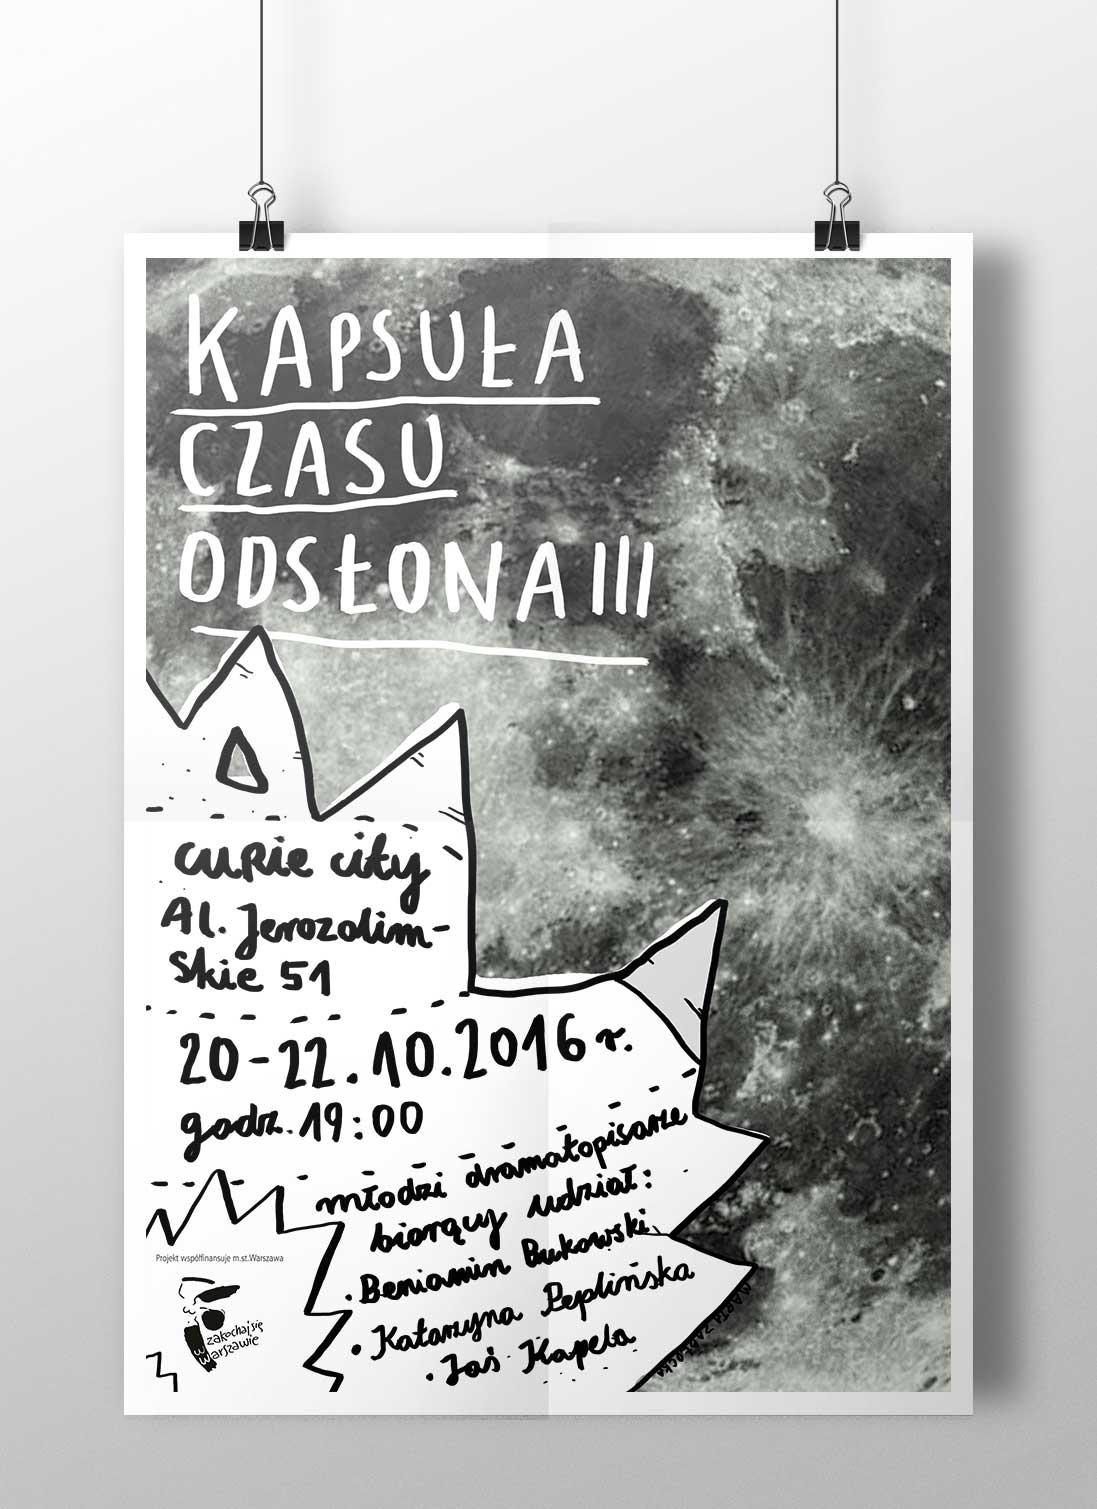 Curie City - Kapsuła Czasu